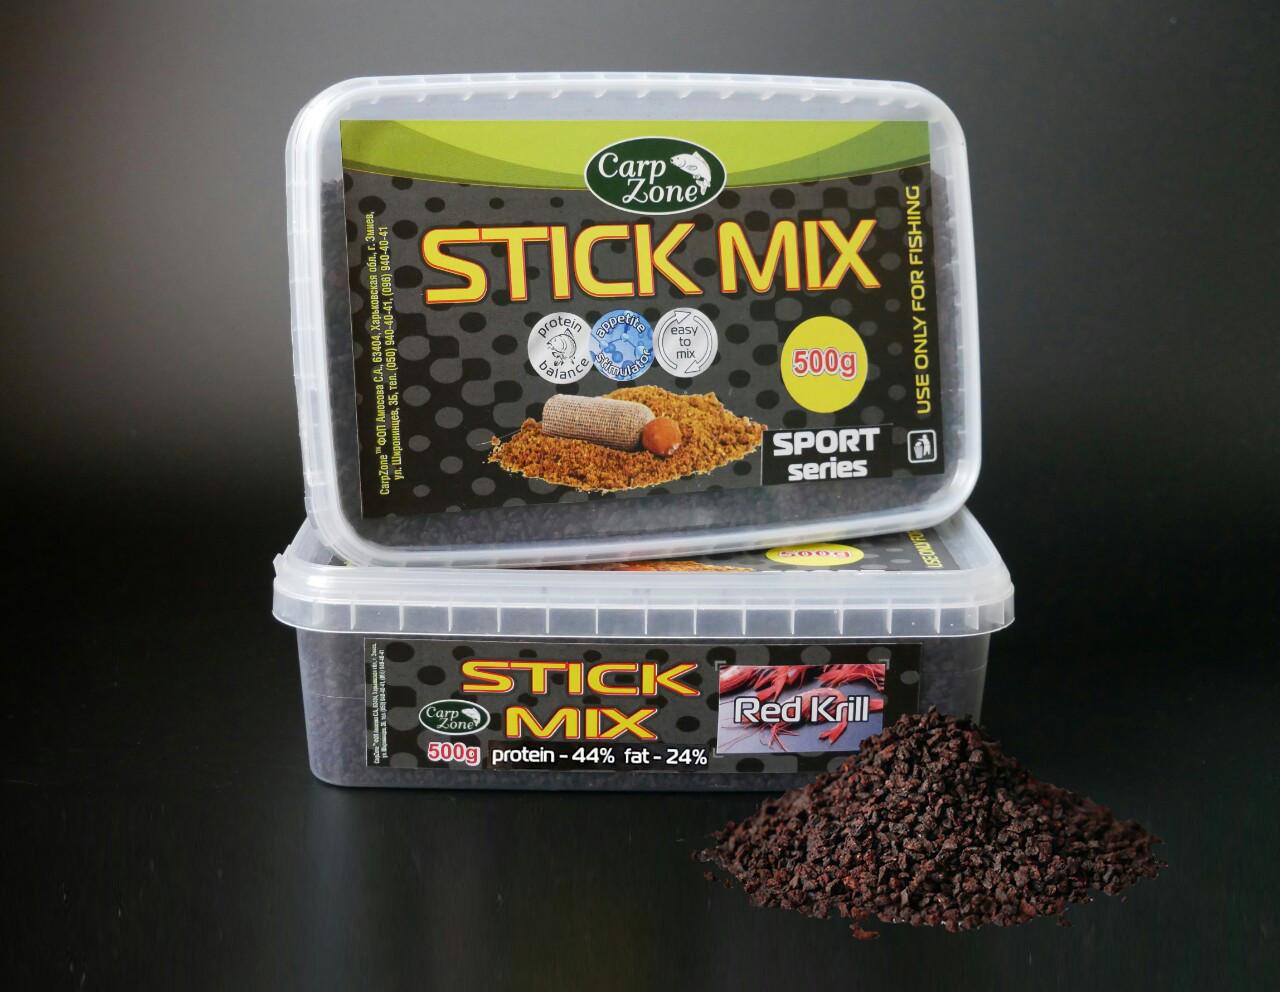 Стик Микс Stick Mix SPORT series Red Кrill (Красная Креветка) 500g